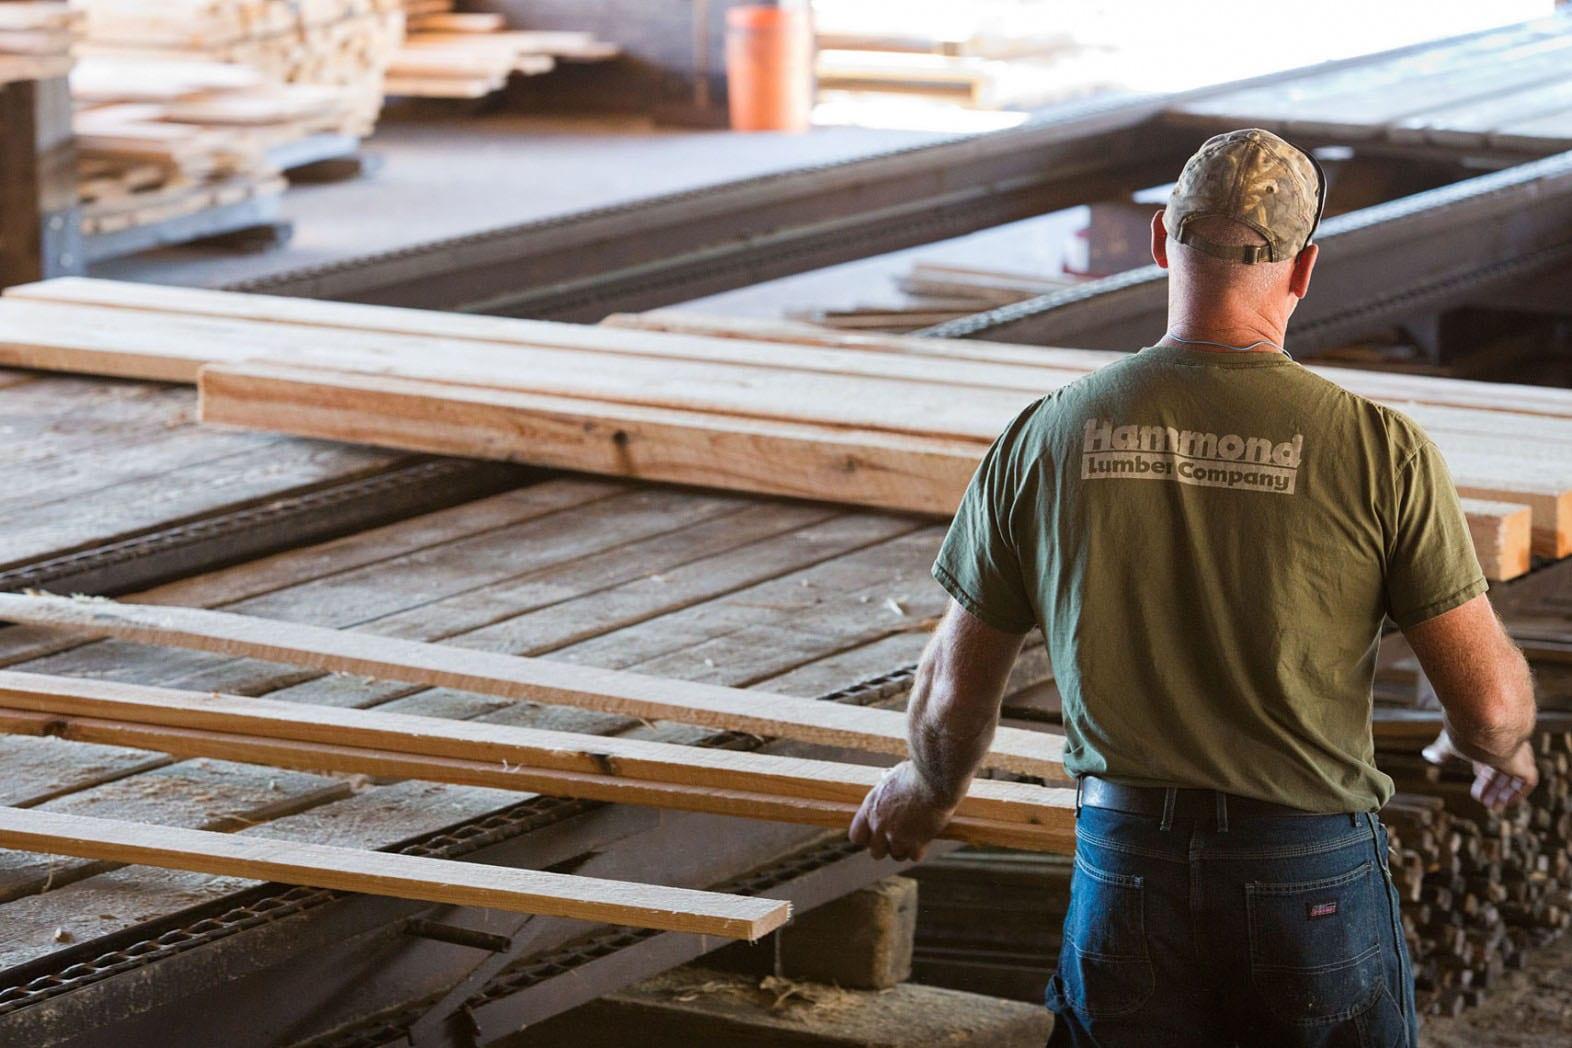 Eastern White Pine & Hemlock Manufacturing - Hammond Lumber